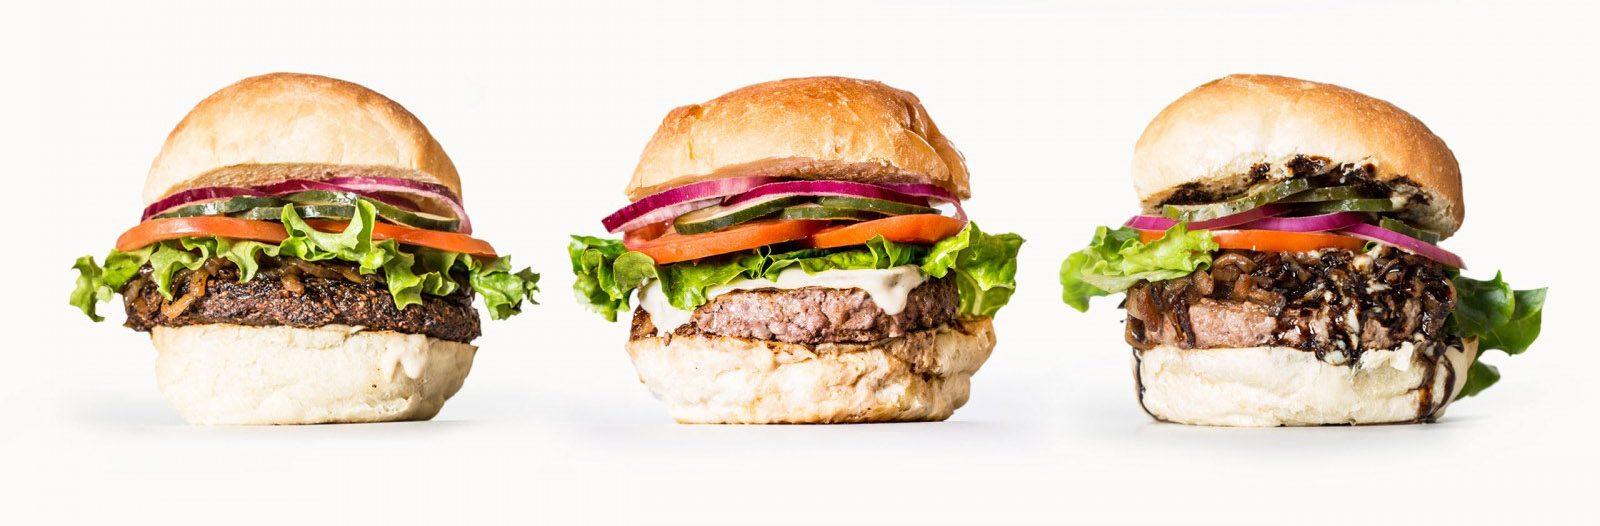 Primal Burger food photography